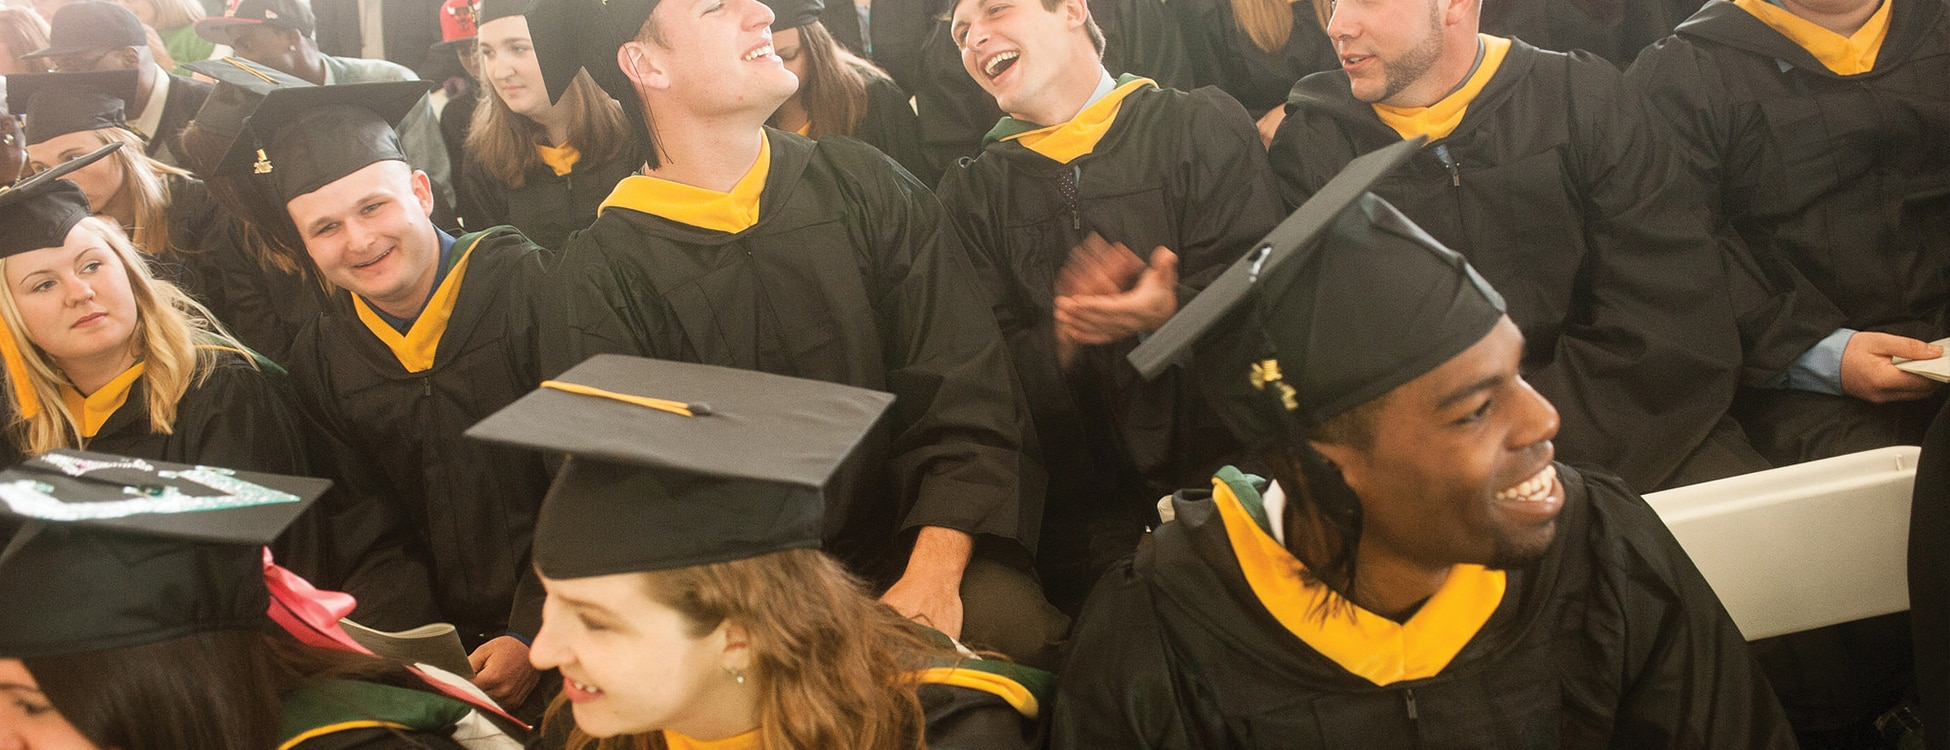 commencement, graduation, 99% placement rate, smiling